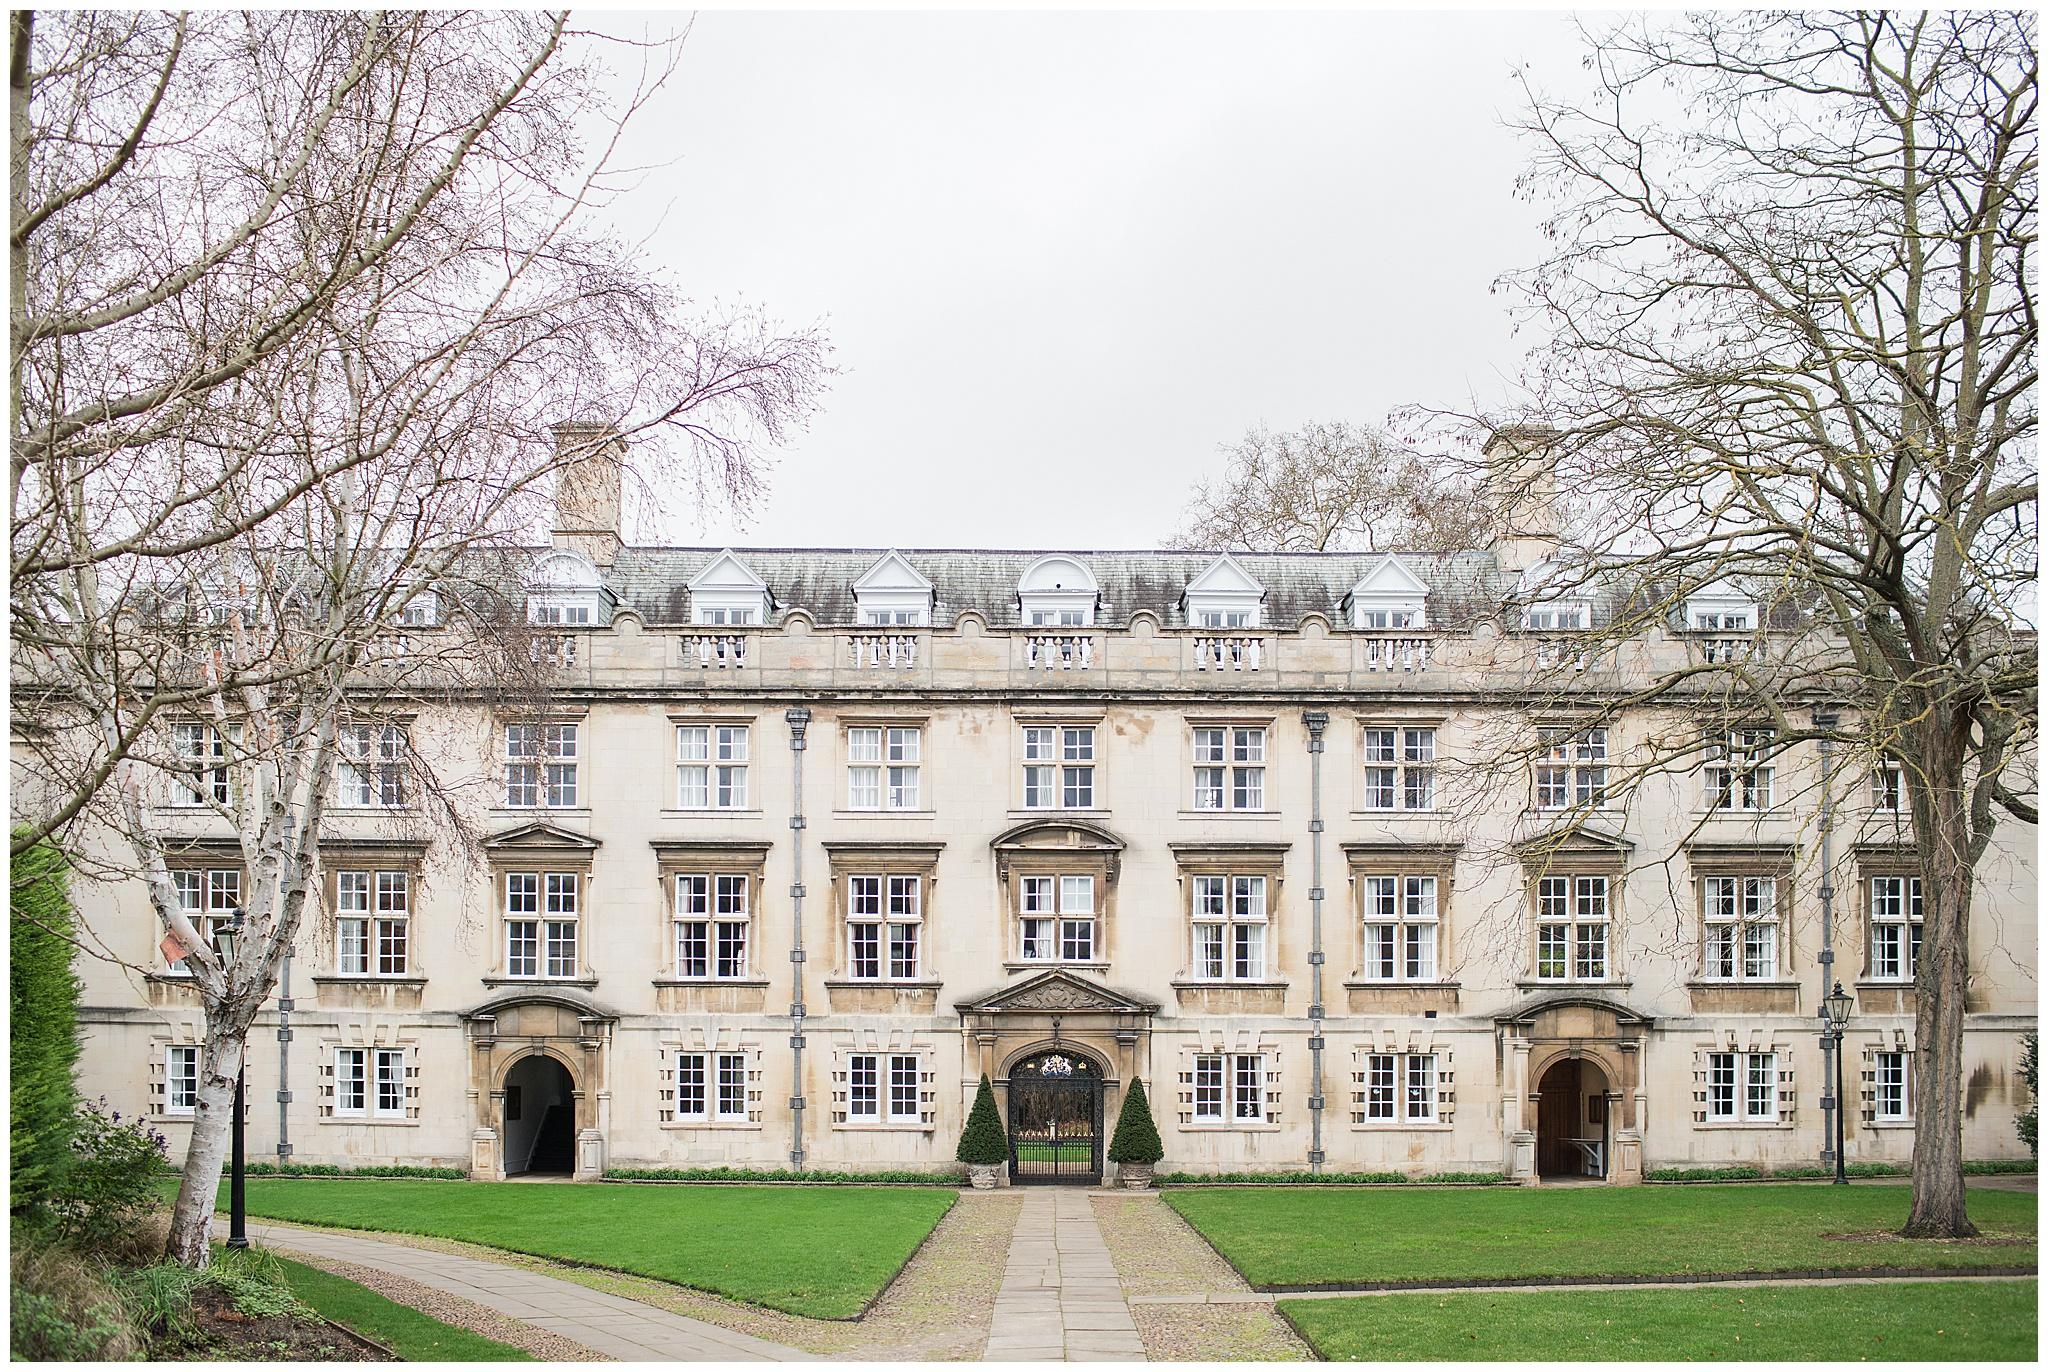 Cambridge_day1_0006.jpg